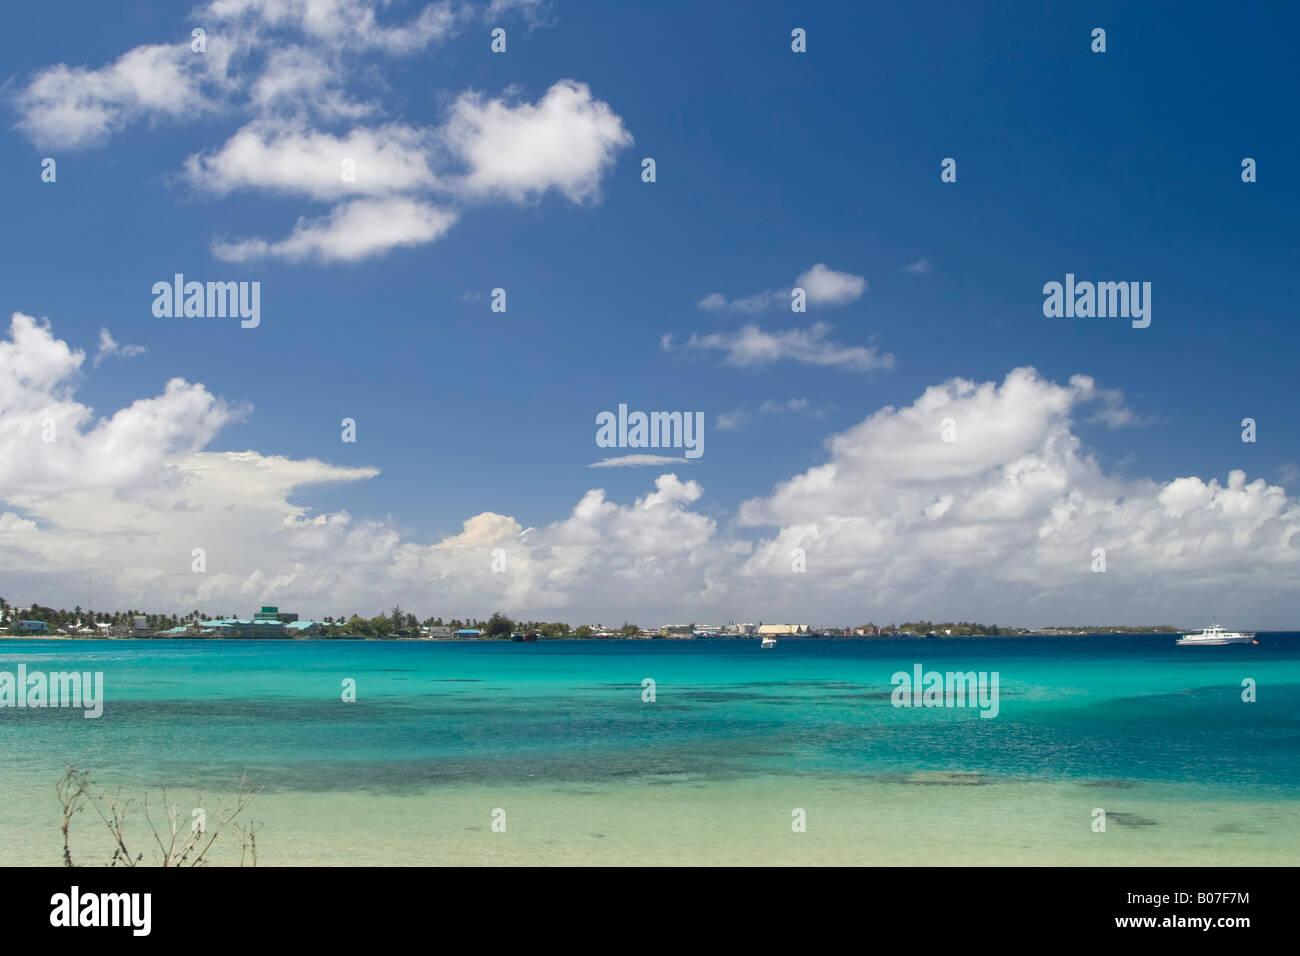 Majuro Lagoon, Marshall Islands - Stock Image